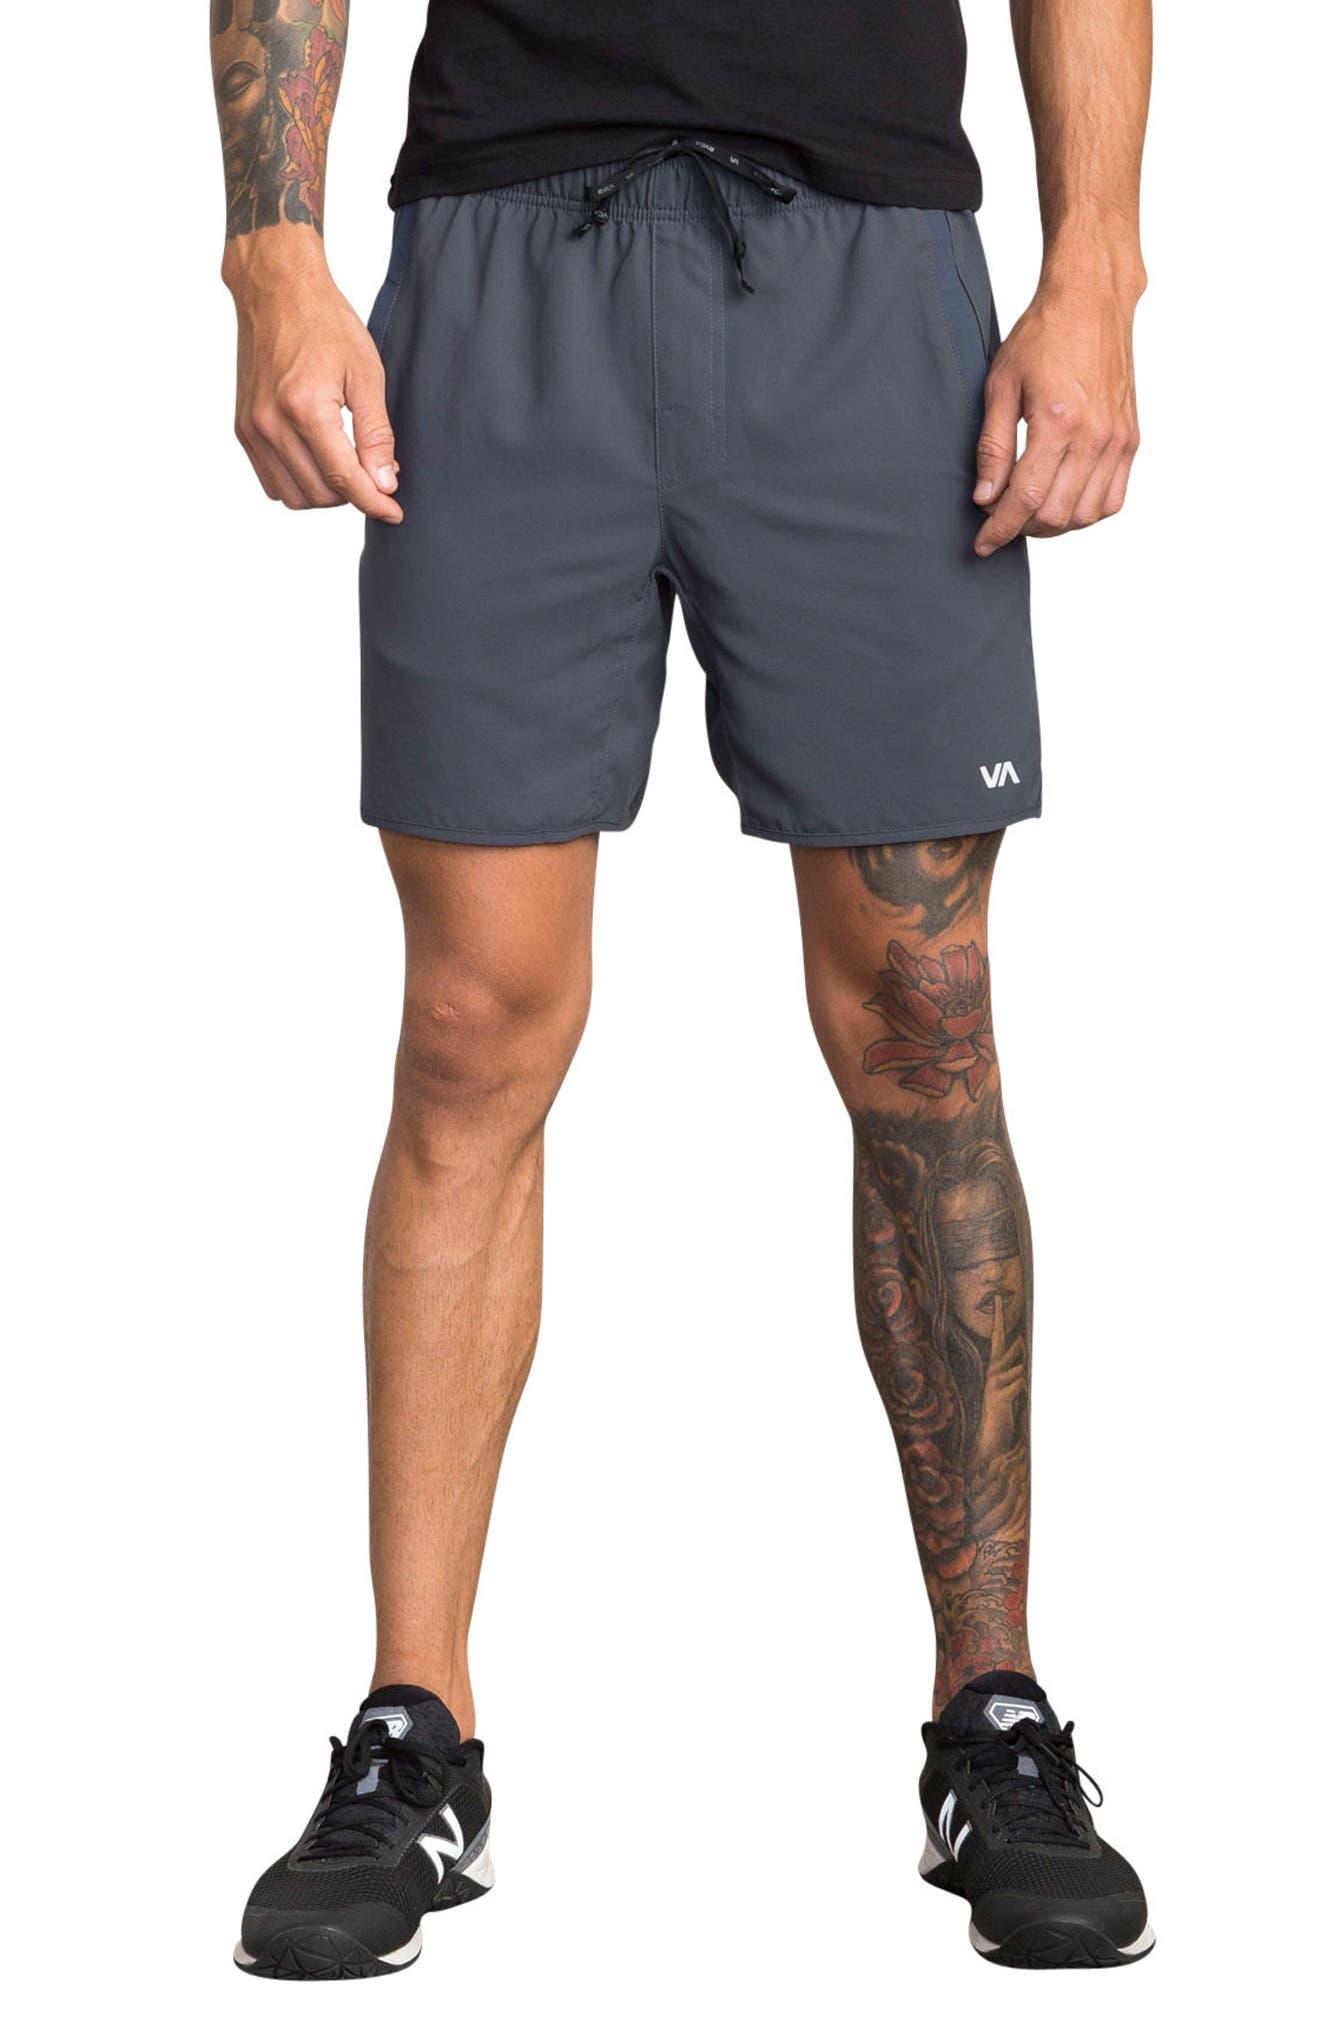 Main Image - RVCA Yogger III Athletic Shorts